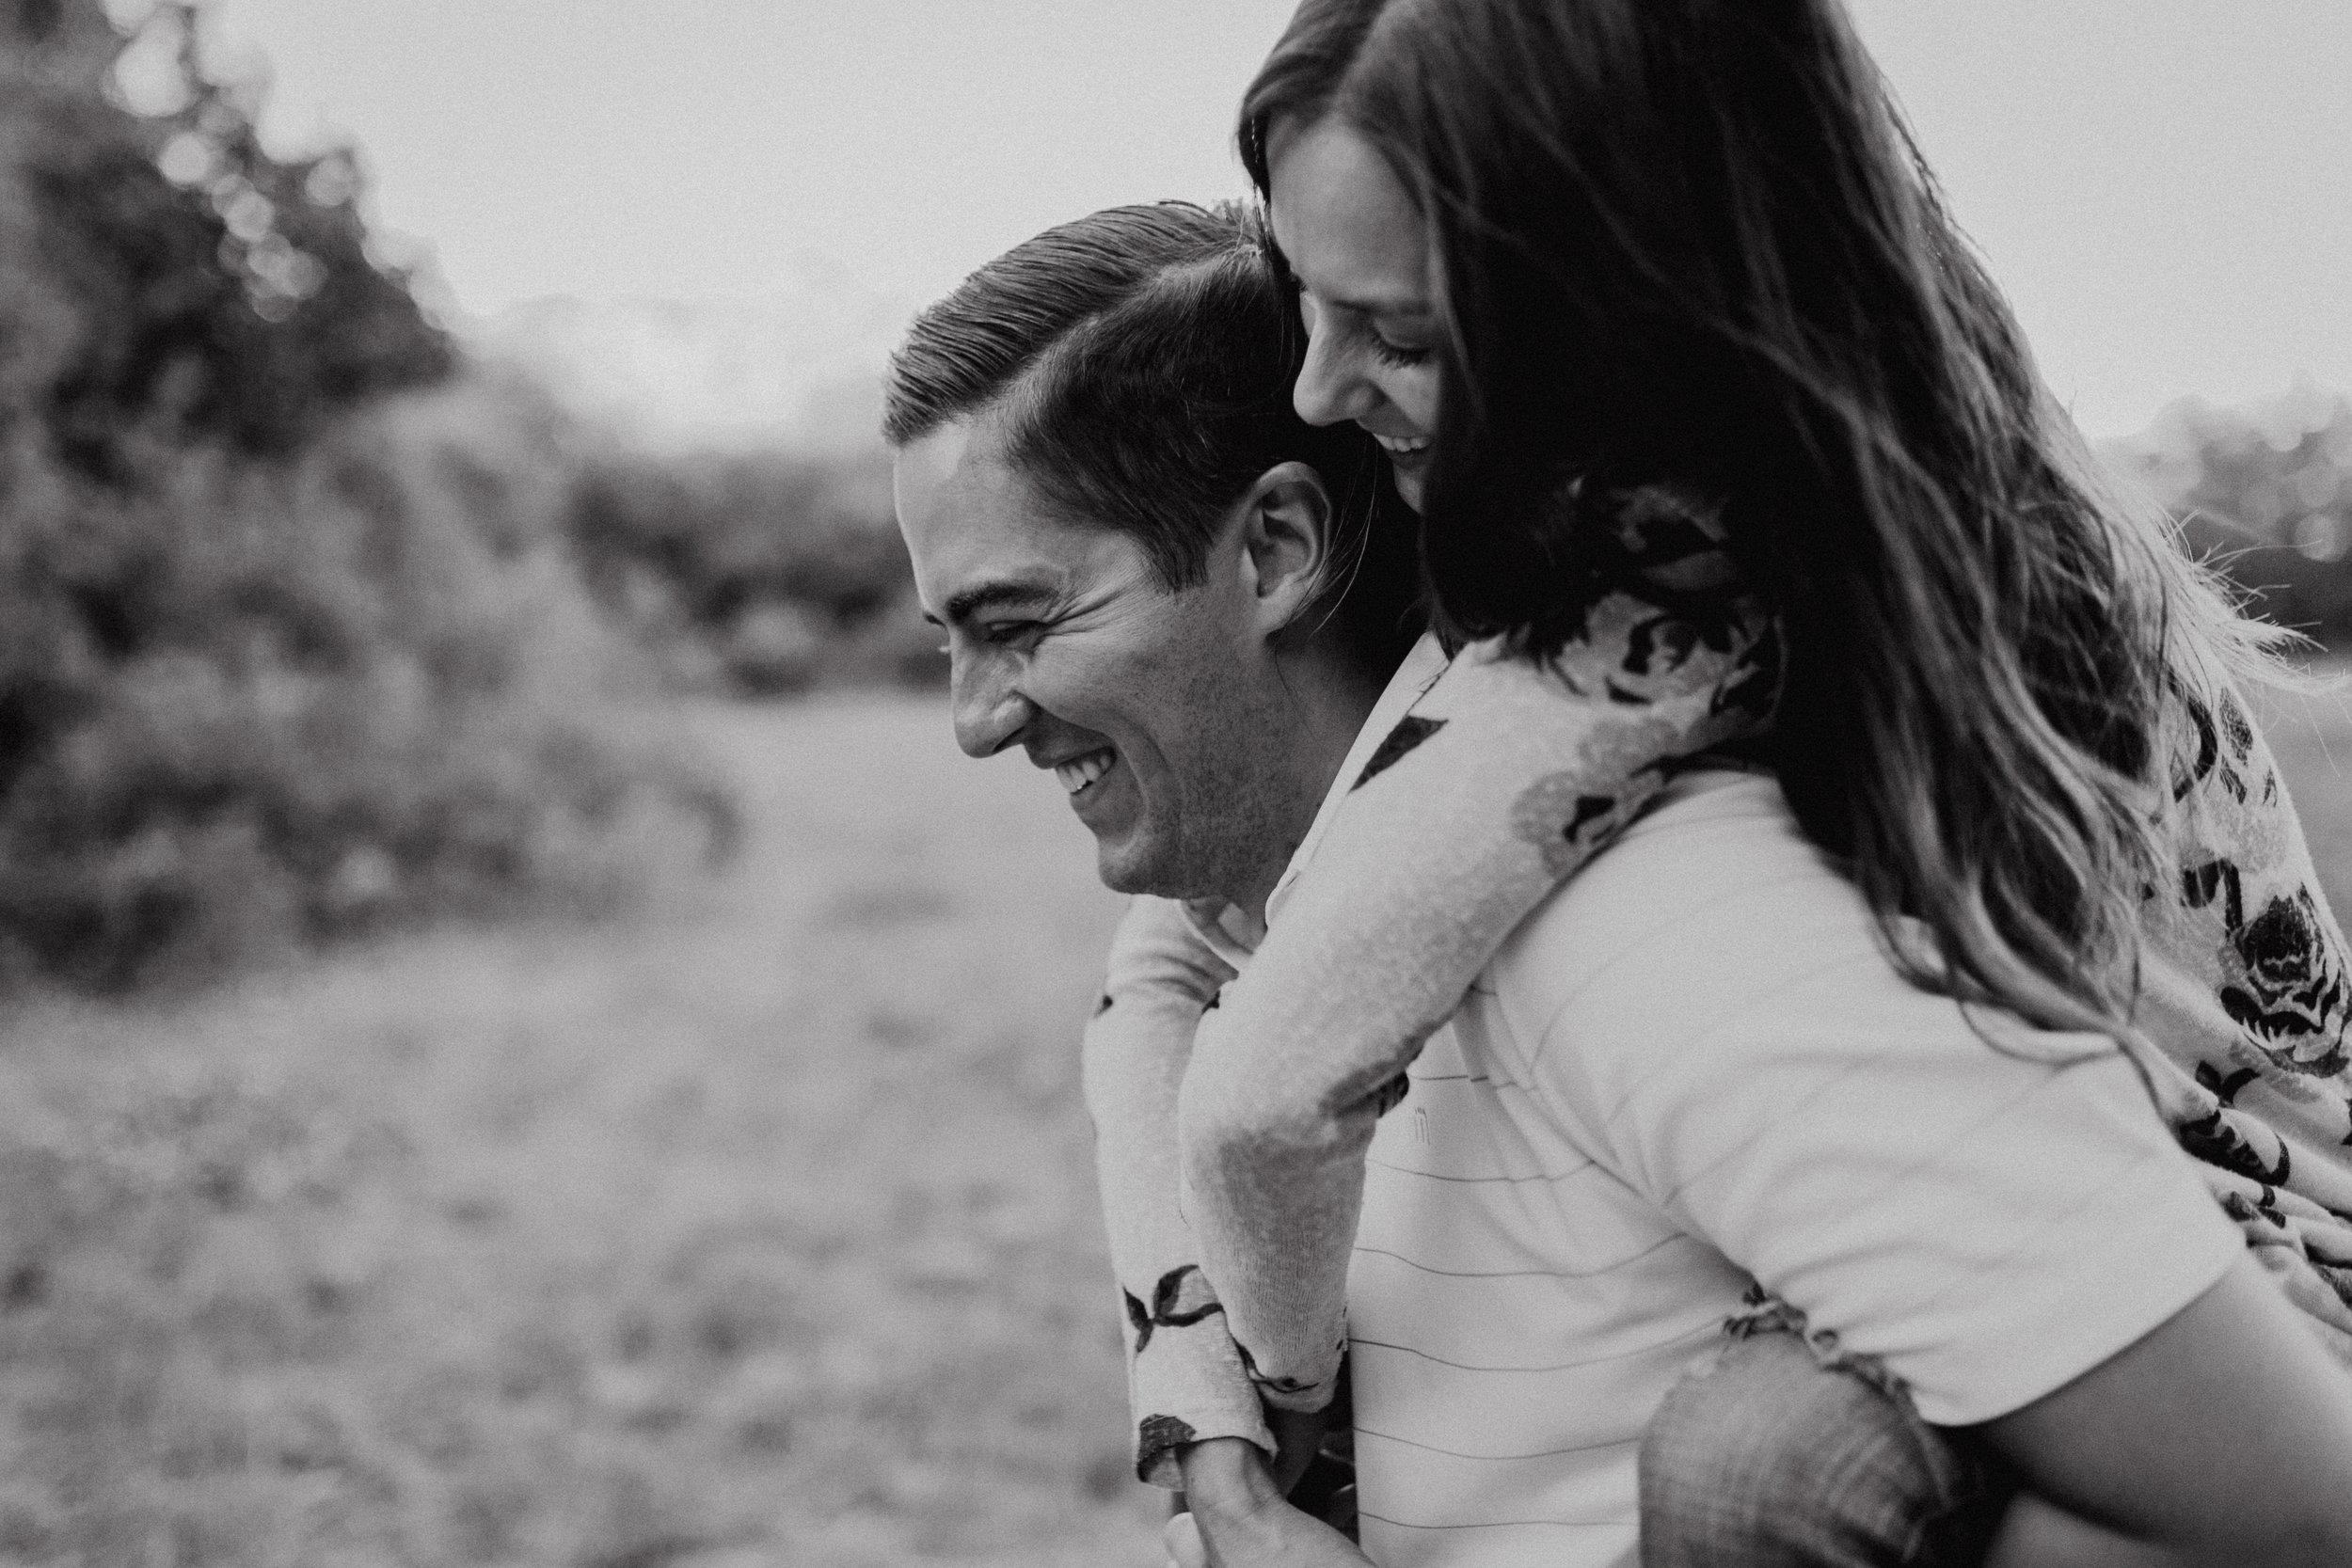 Shandra_Kasey_Engagement-35-2.jpg